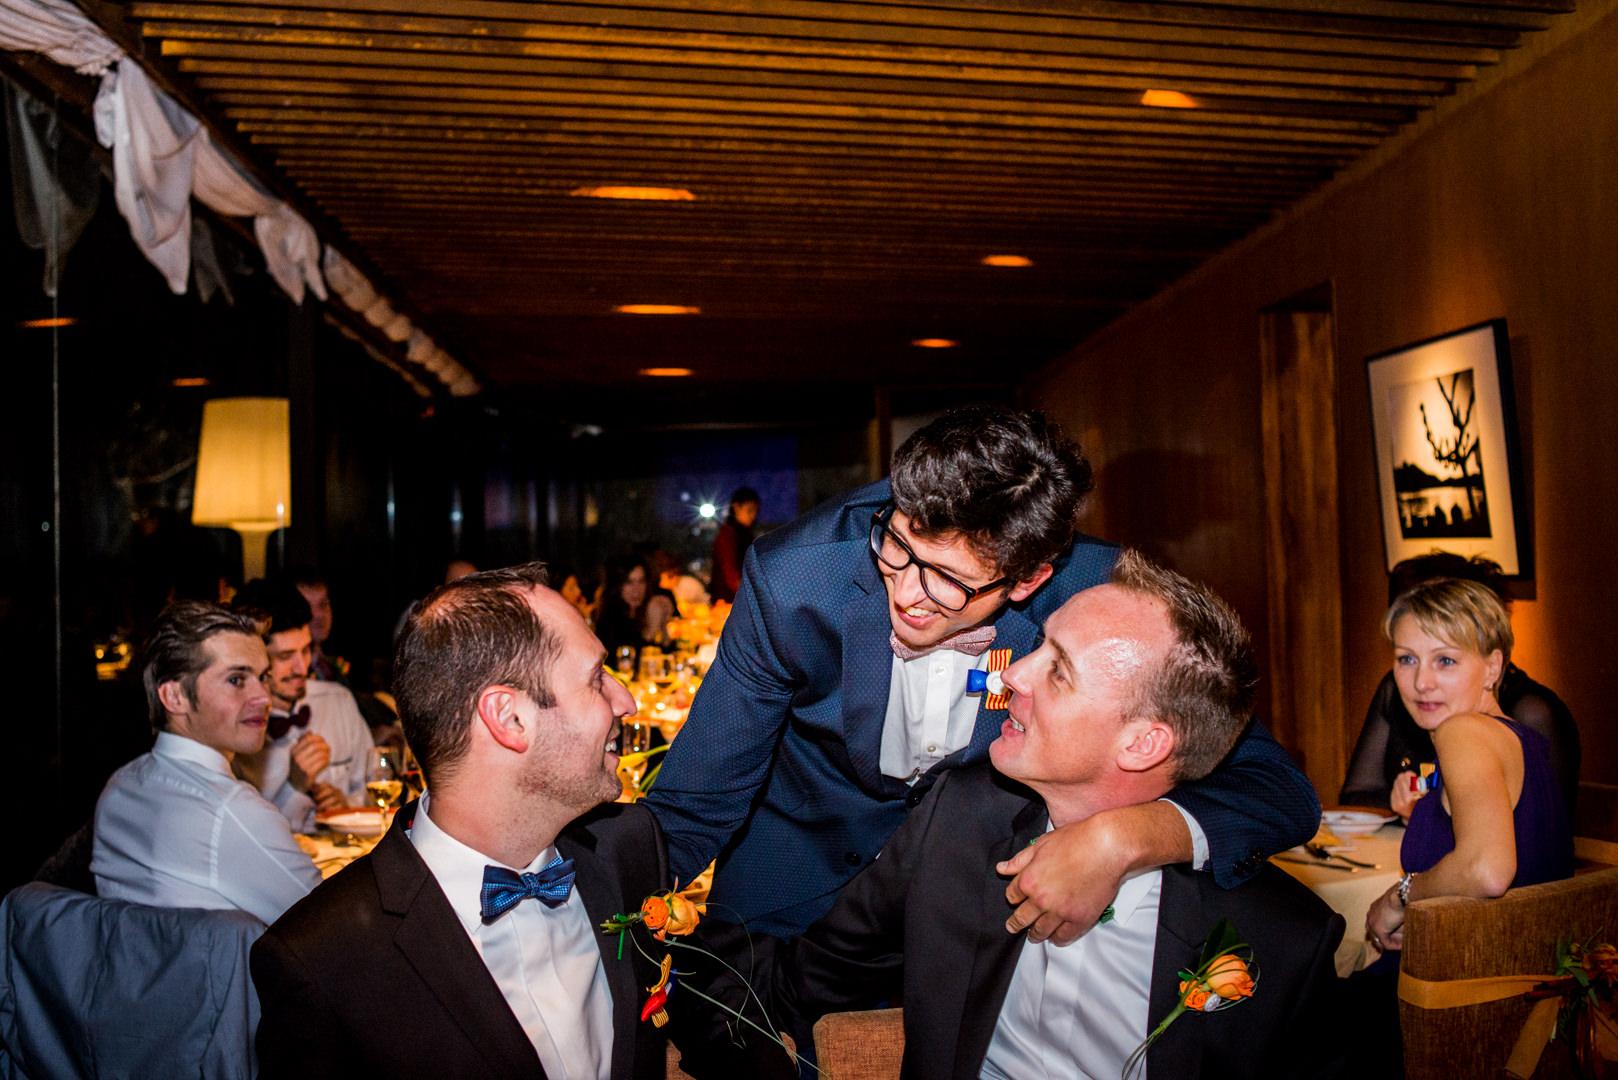 Same-sex-wedding-barcelona-boda- gay-samesex-engagement-Rafael-Torres-fotografo-bodas-sevilla-madrid-barcelona-wedding-photographer--50.jpg